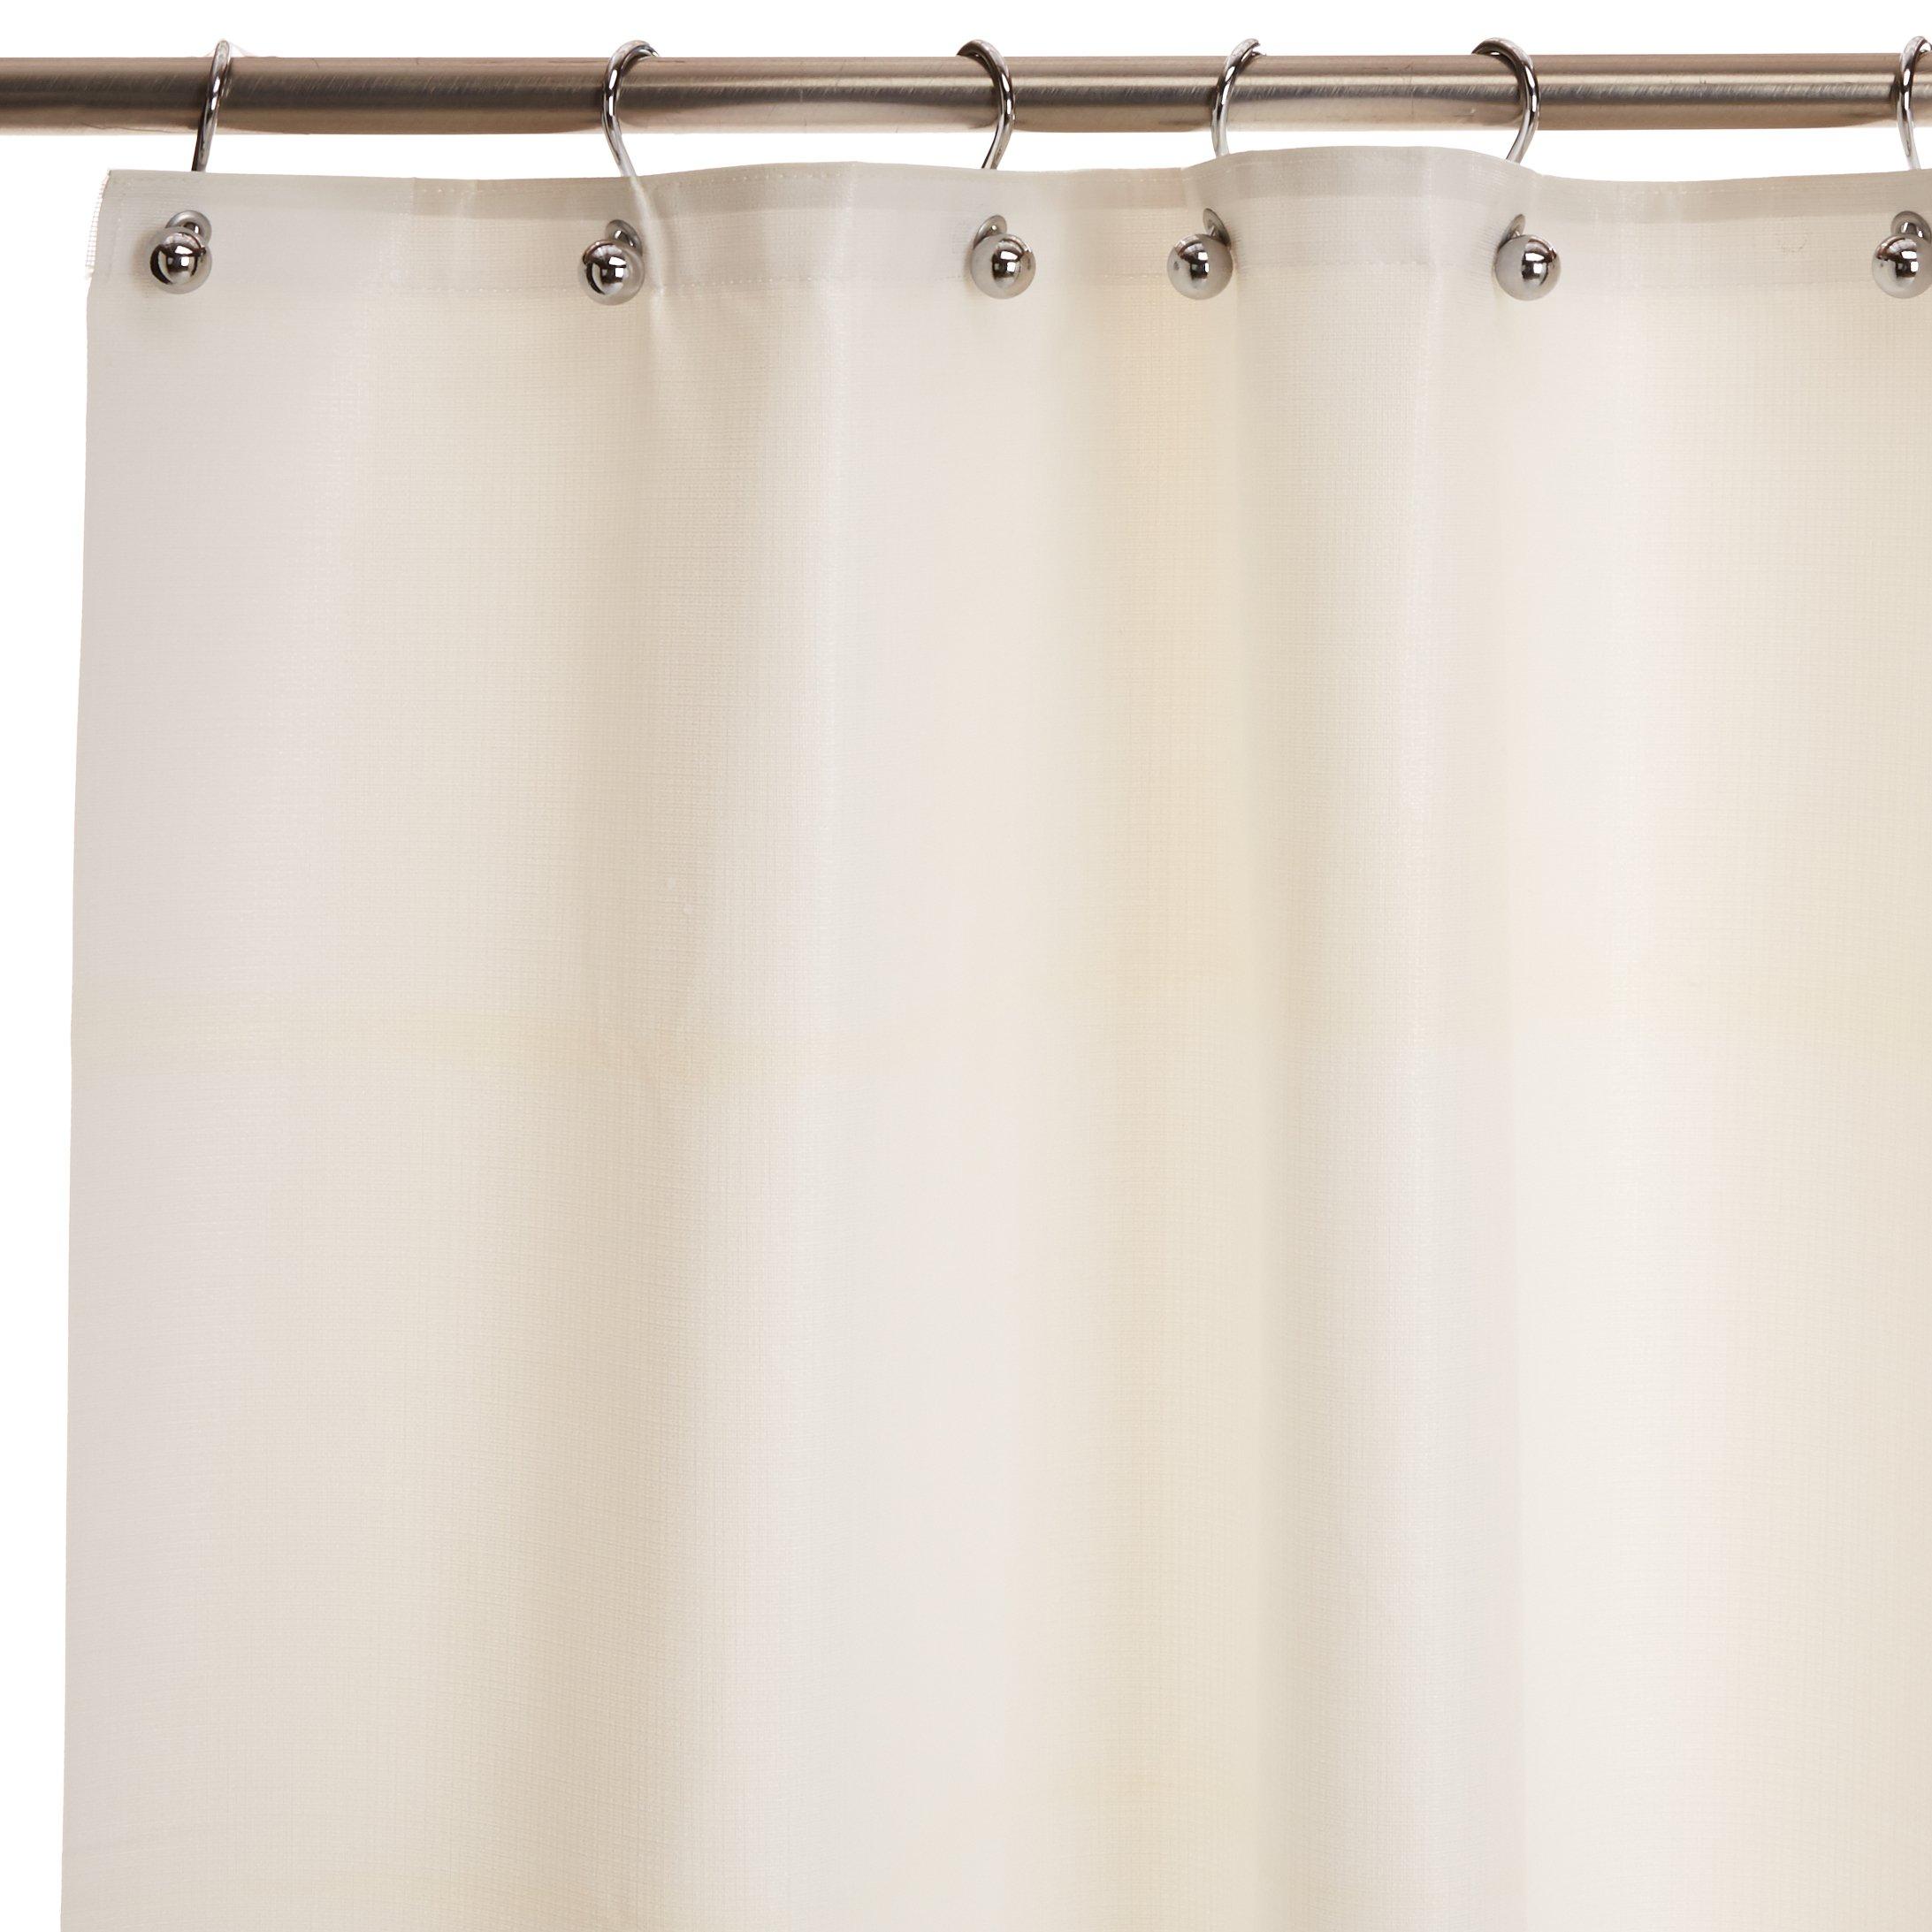 Bradley 9537-727200 Vinyl Antimicrobial Shower Curtain, 72'' Width x 72'' Length, White